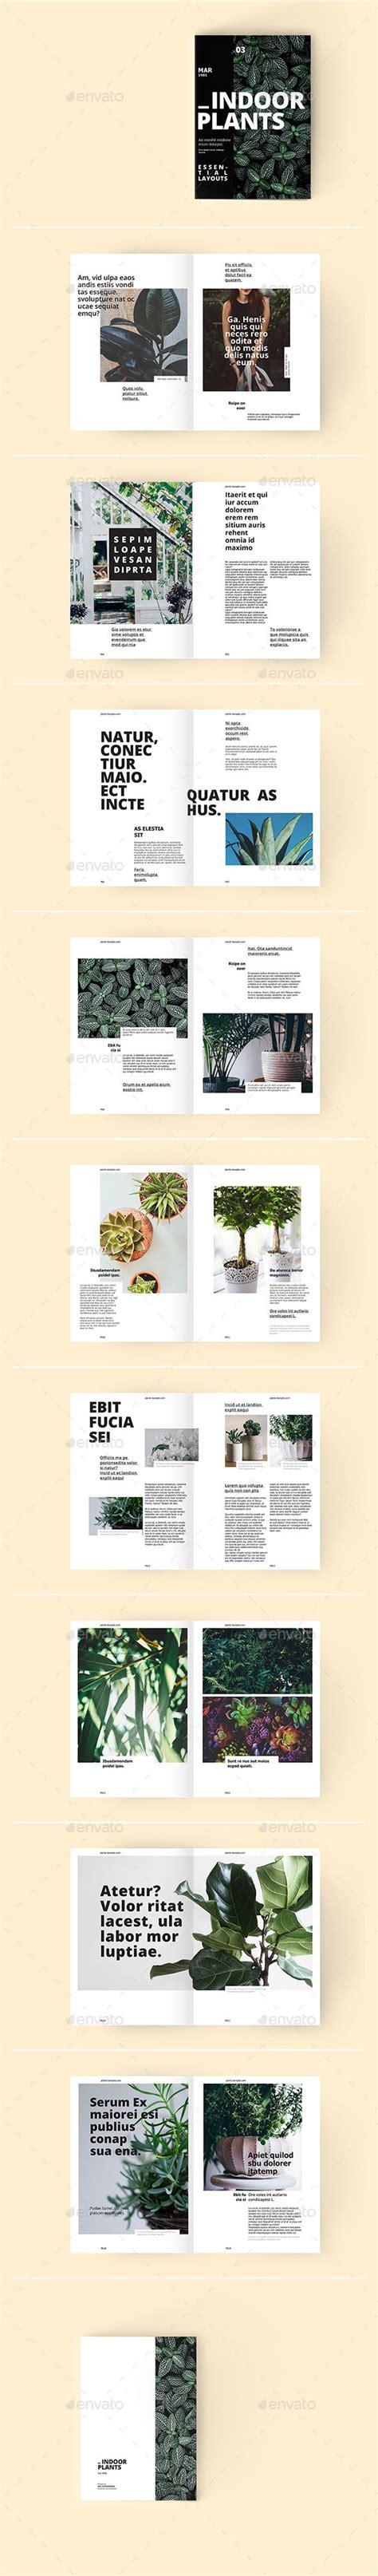 design magazine layout indesign 25 best ideas about magazine spreads on pinterest